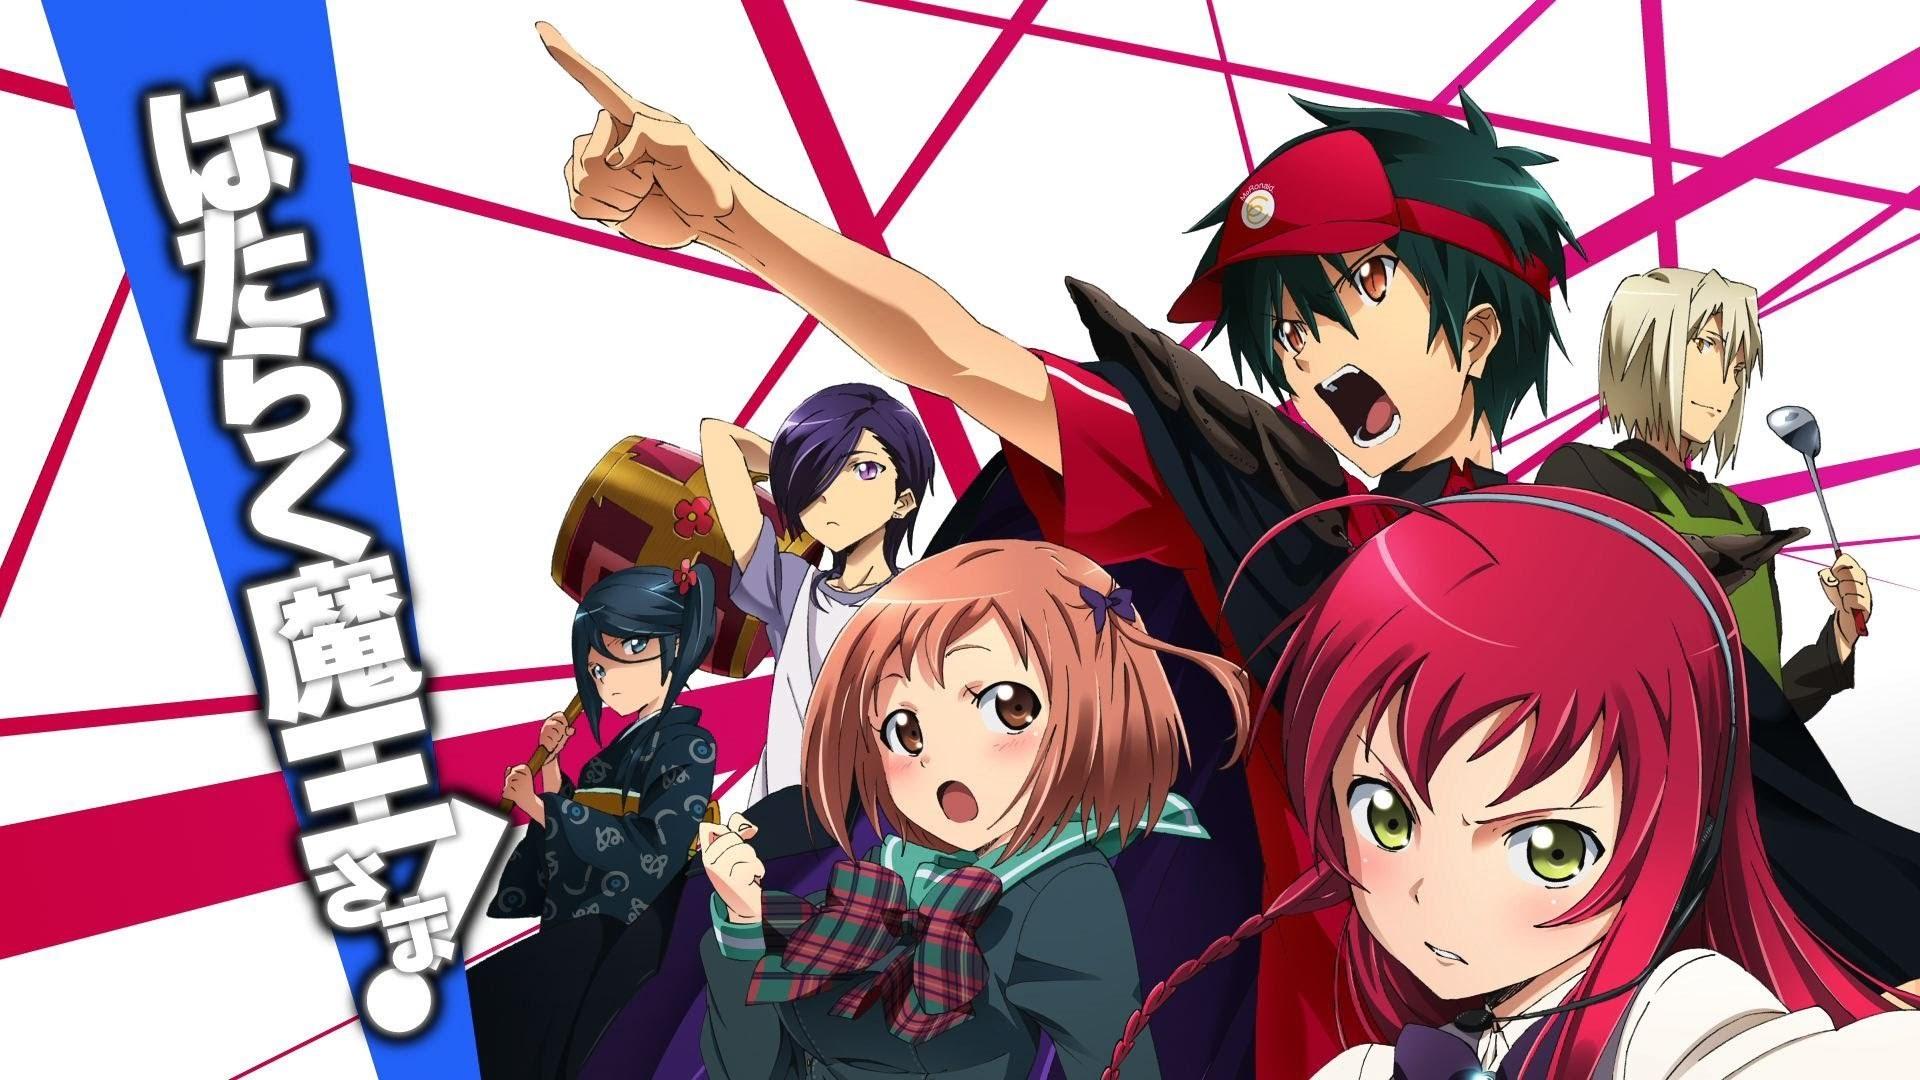 hataraku maou sama sadao mao amy yusa Wallpaper HD Anime 4K 1920x1080